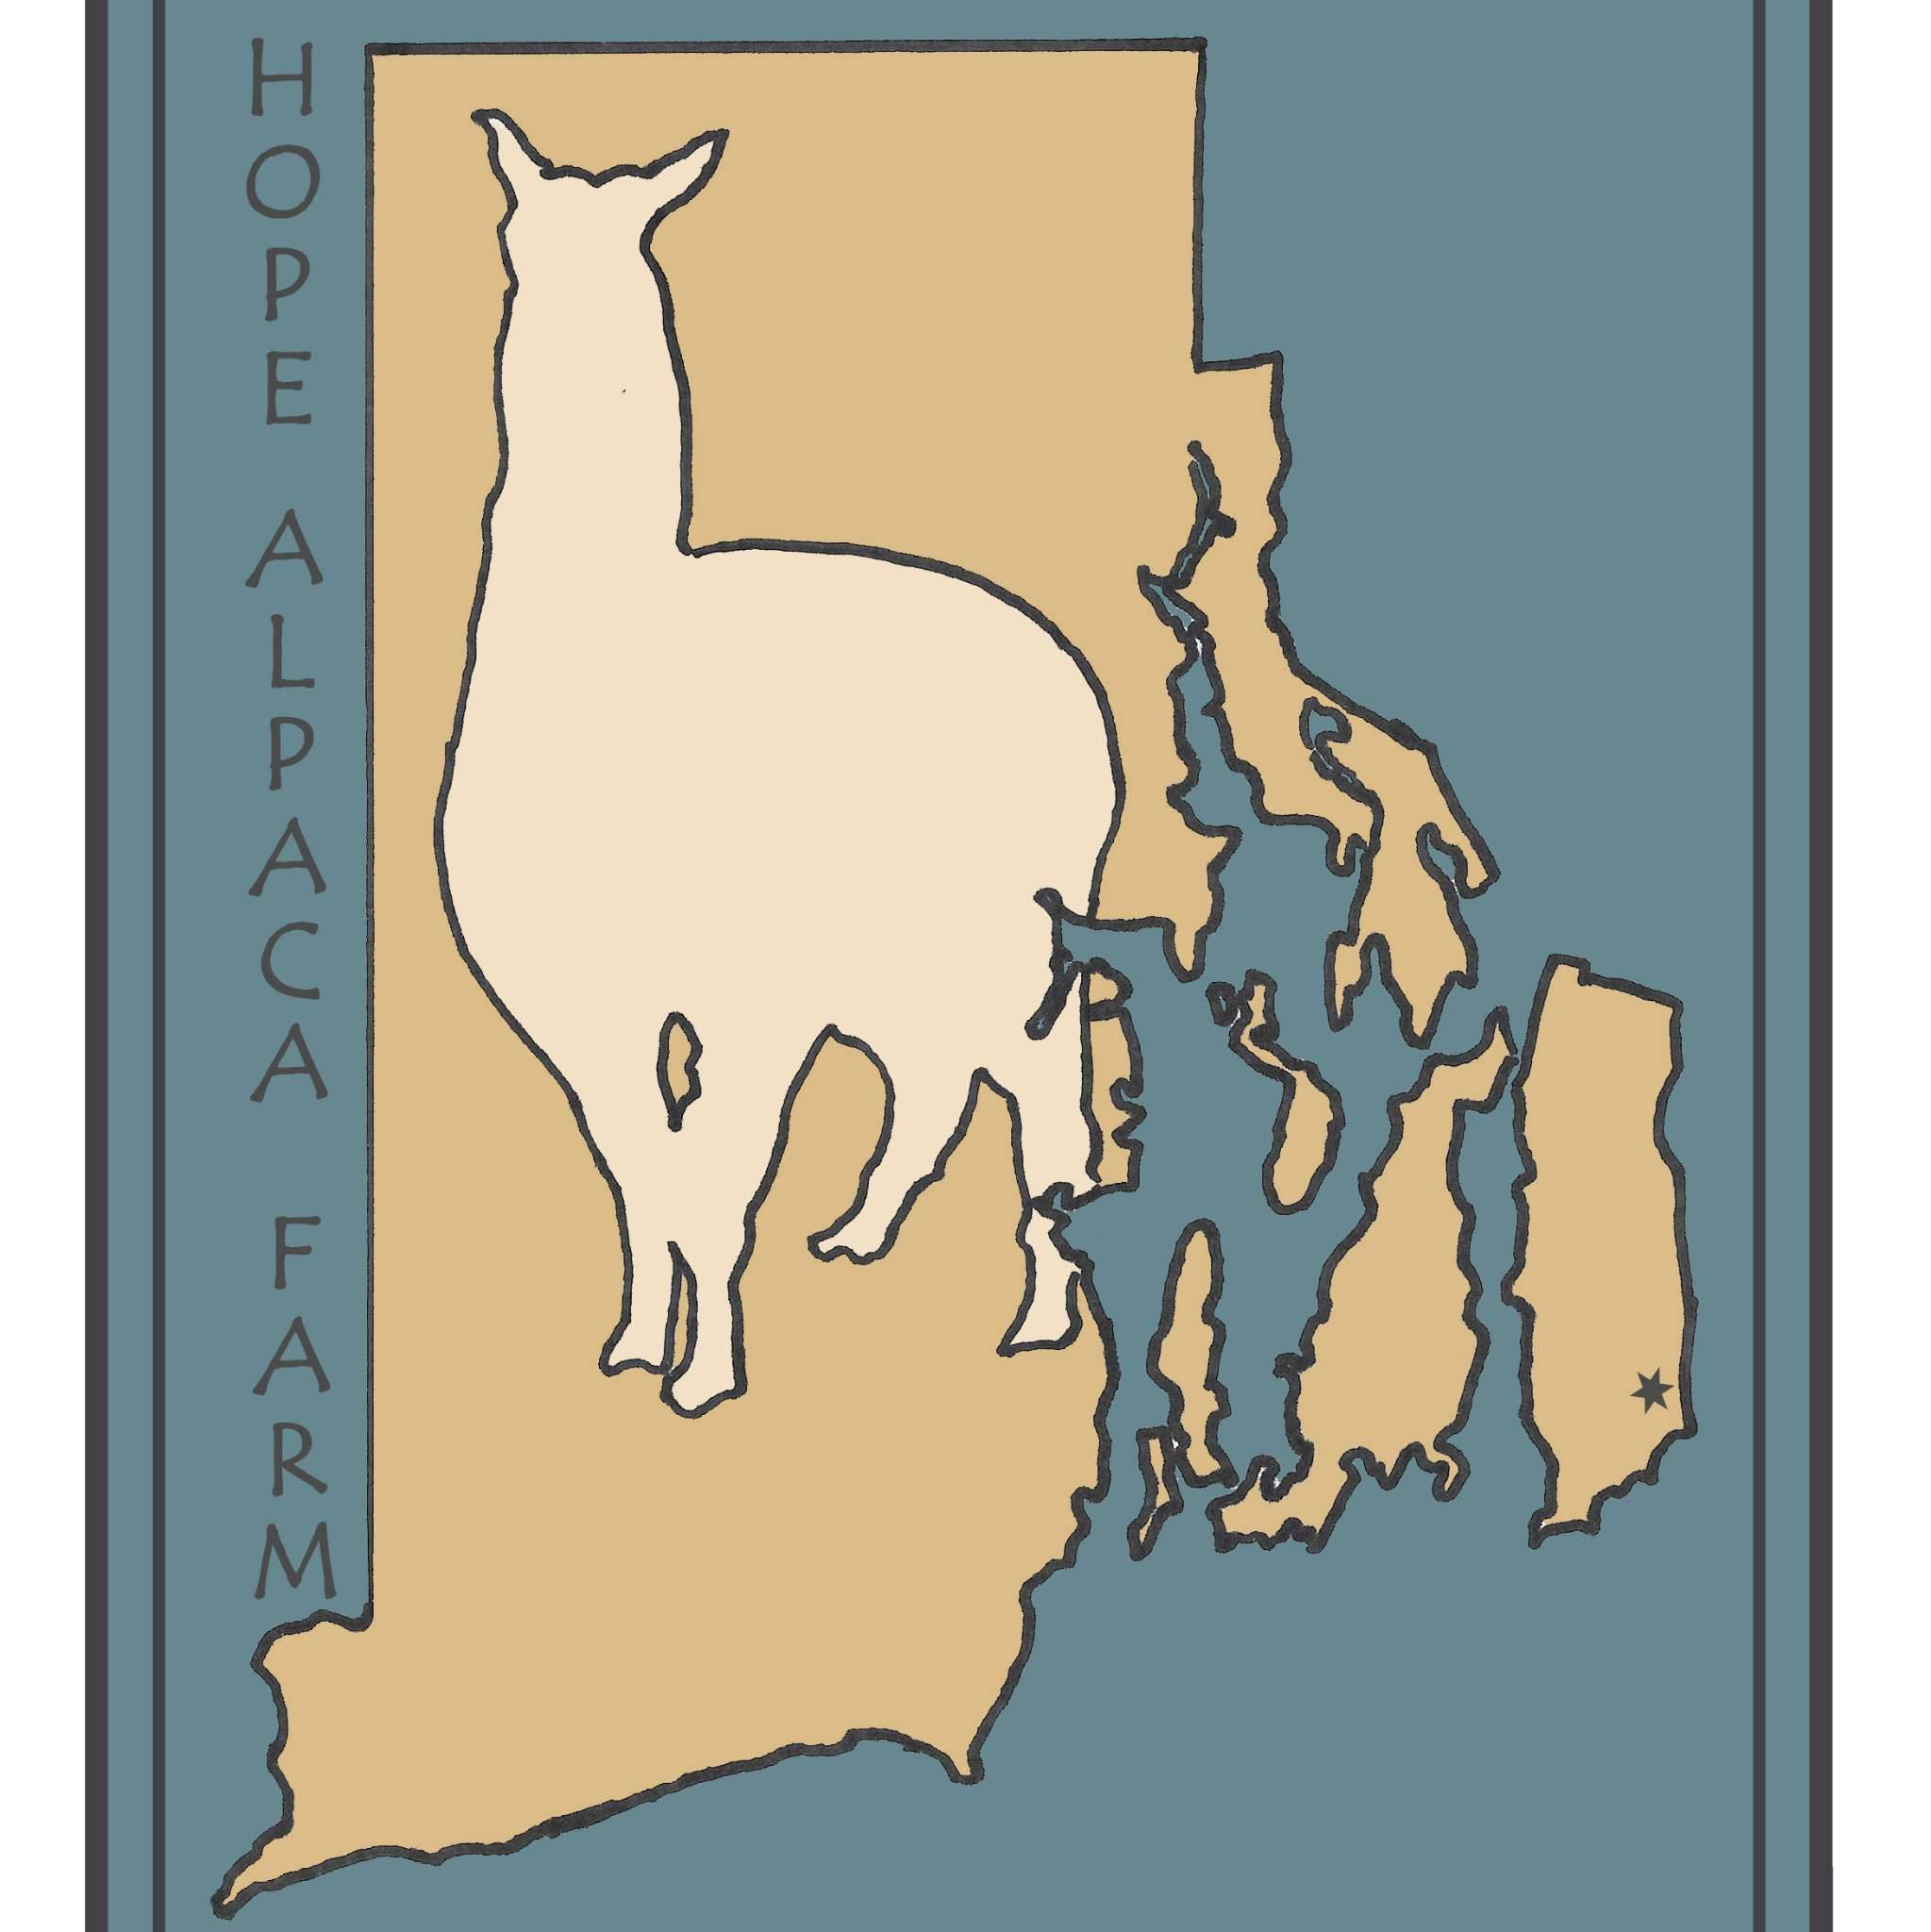 Hope Alpaca Farm Logo